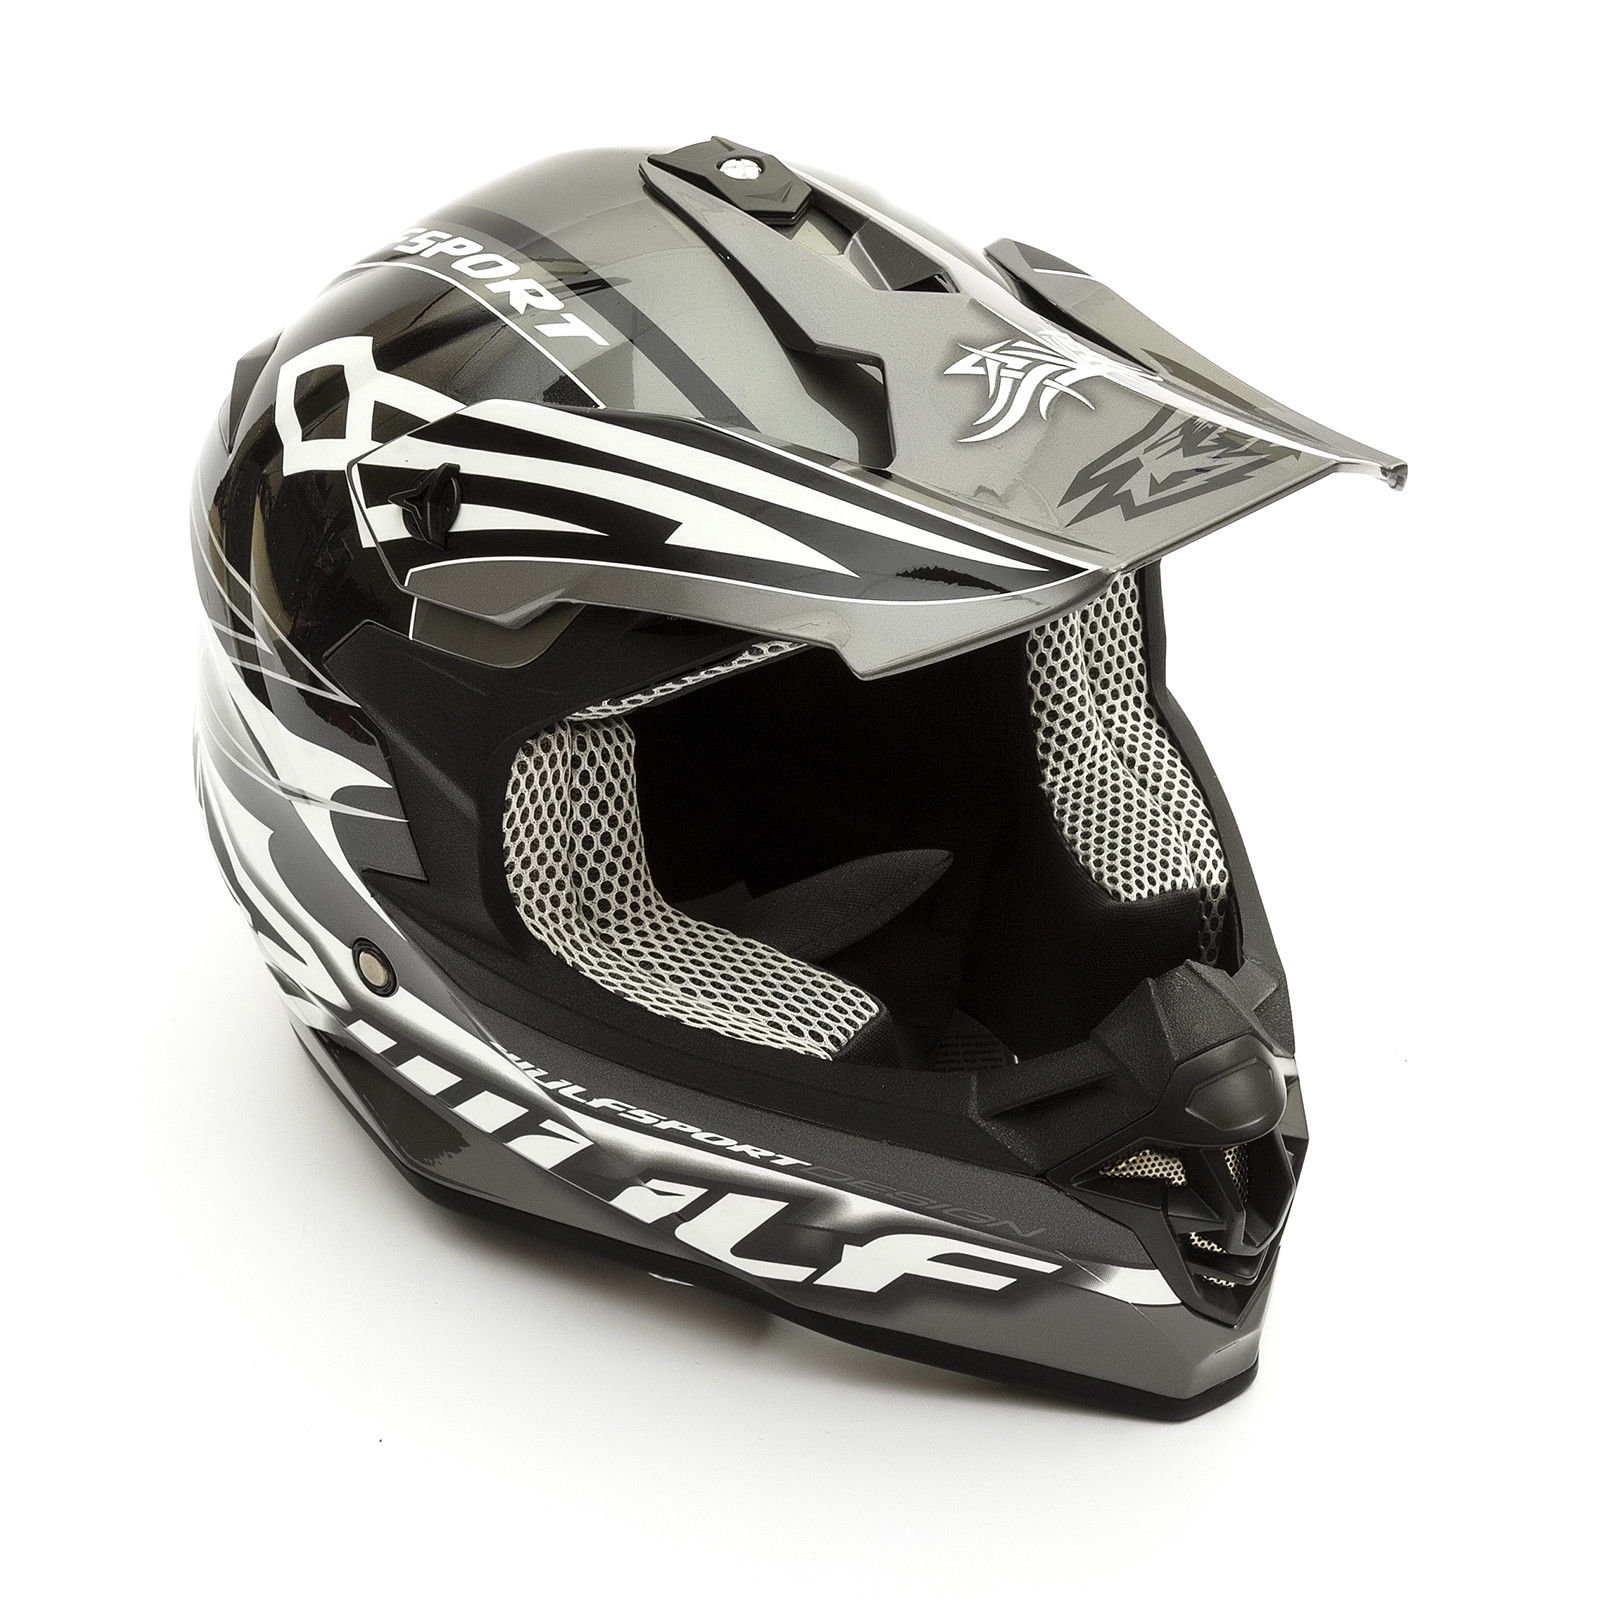 Wulfsport-Adult-Sceptre-Helmets-Motocross-Pitbike-Motorbike-Off-Road-Racing-ATV thumbnail 9